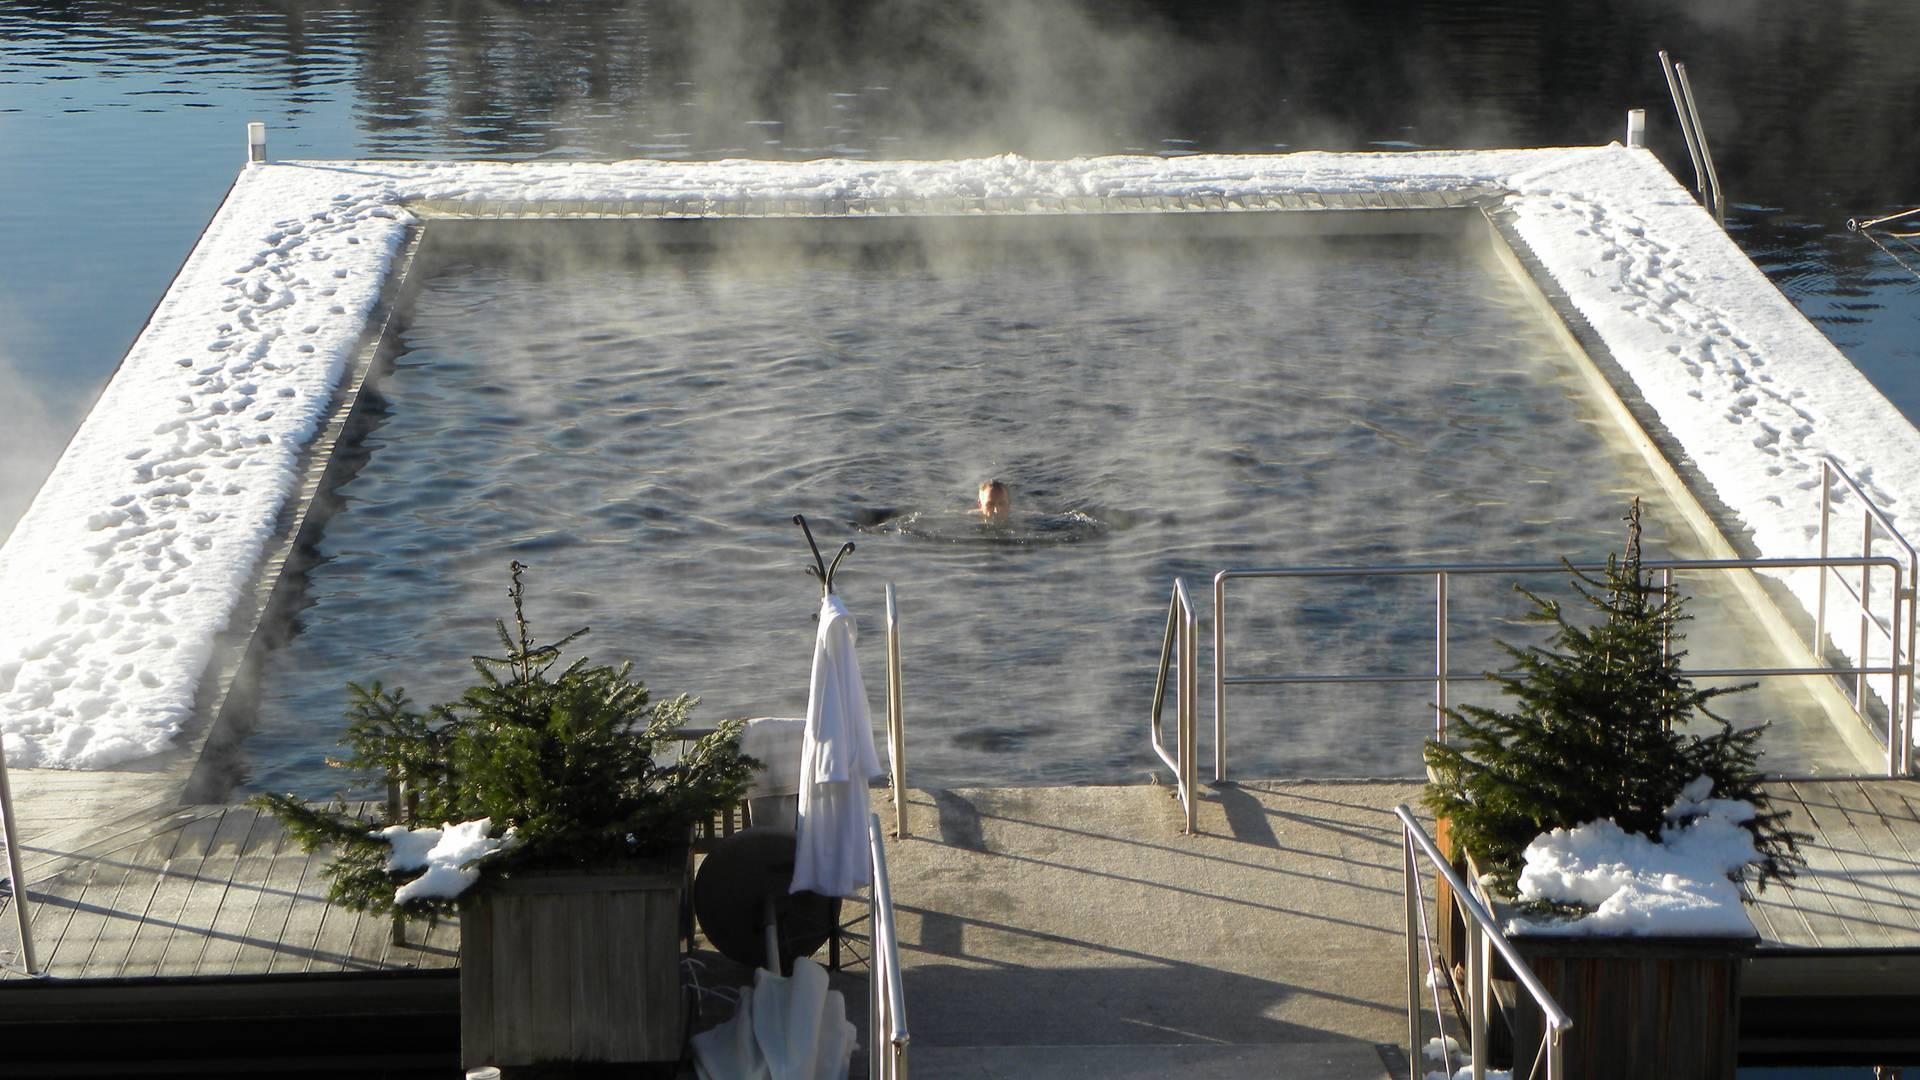 KOLLERs Hotel Seebad im Winter